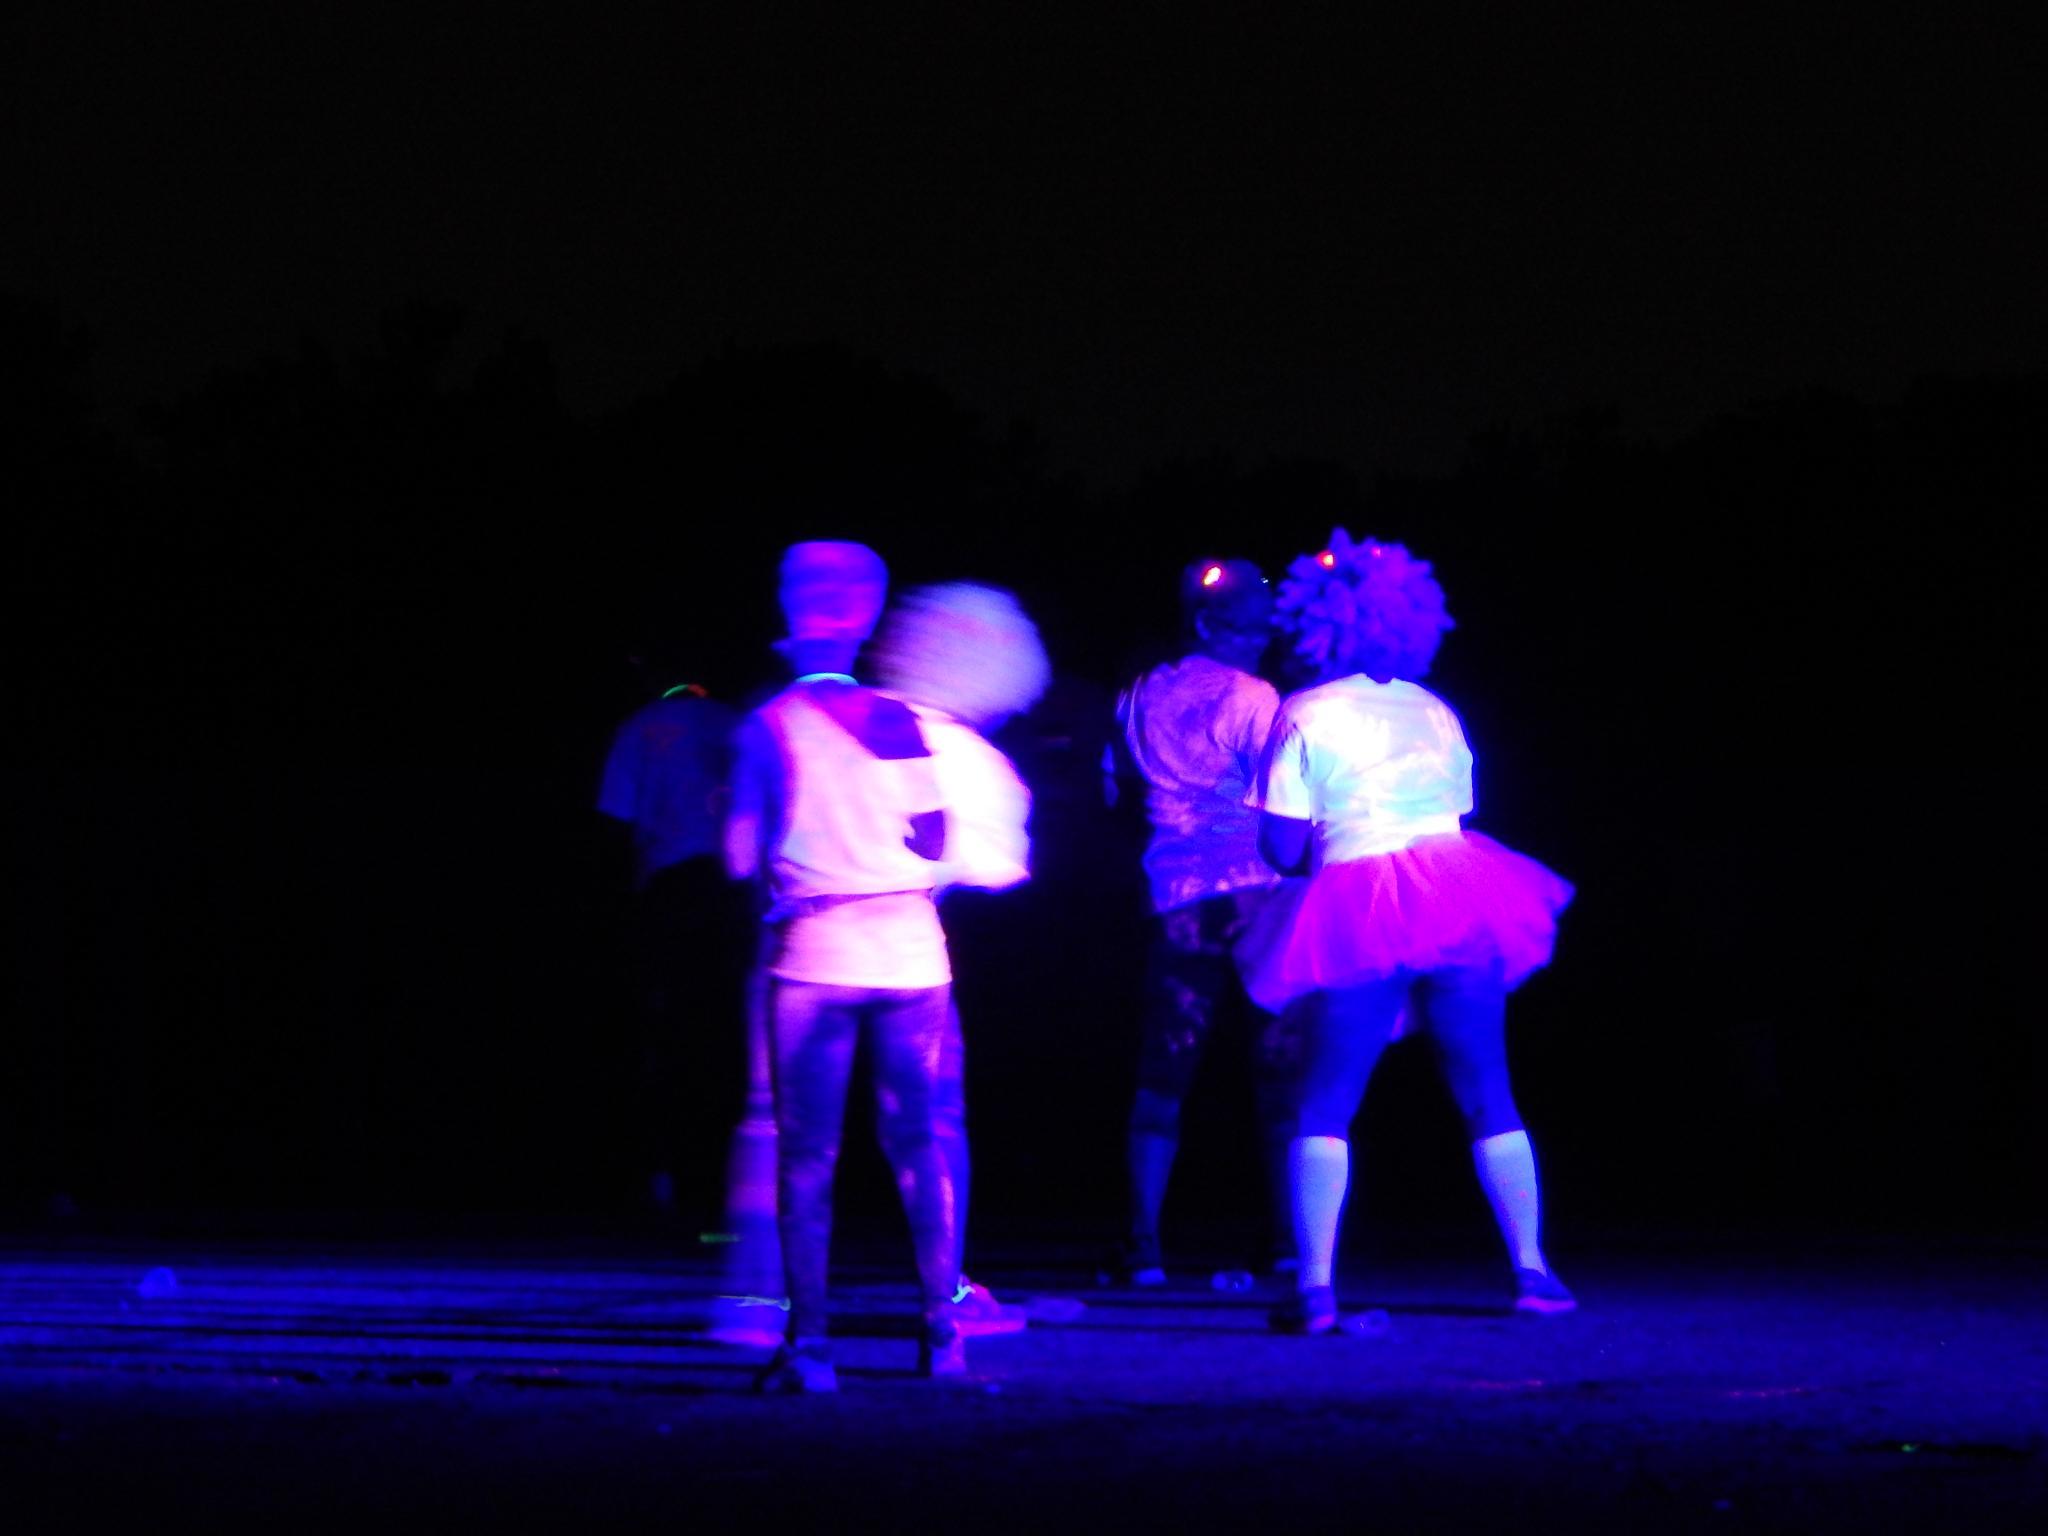 Blacklight run by mythree03